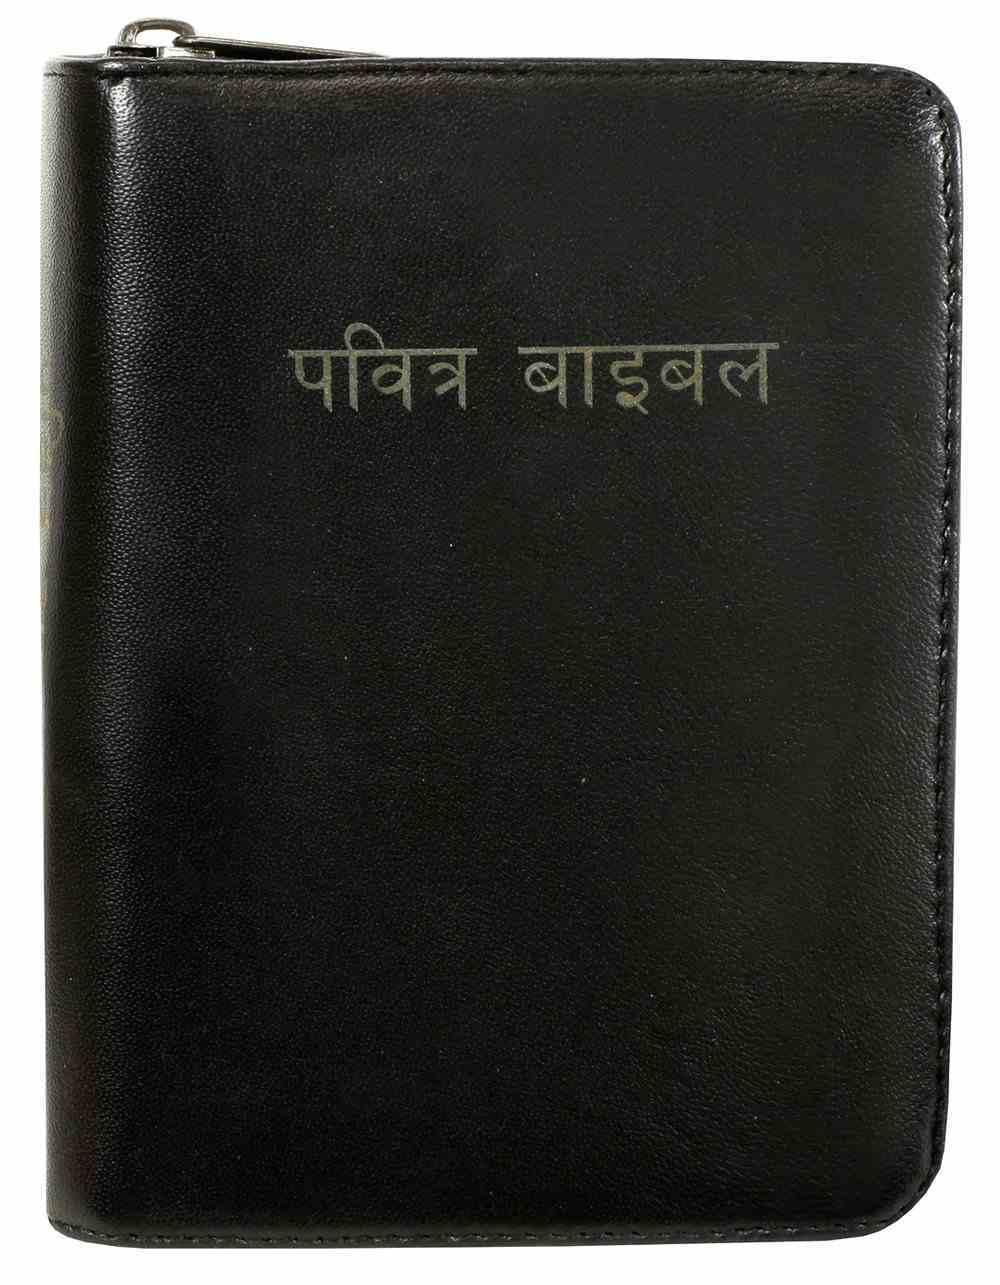 Nepali Revised Bible Black Paperback